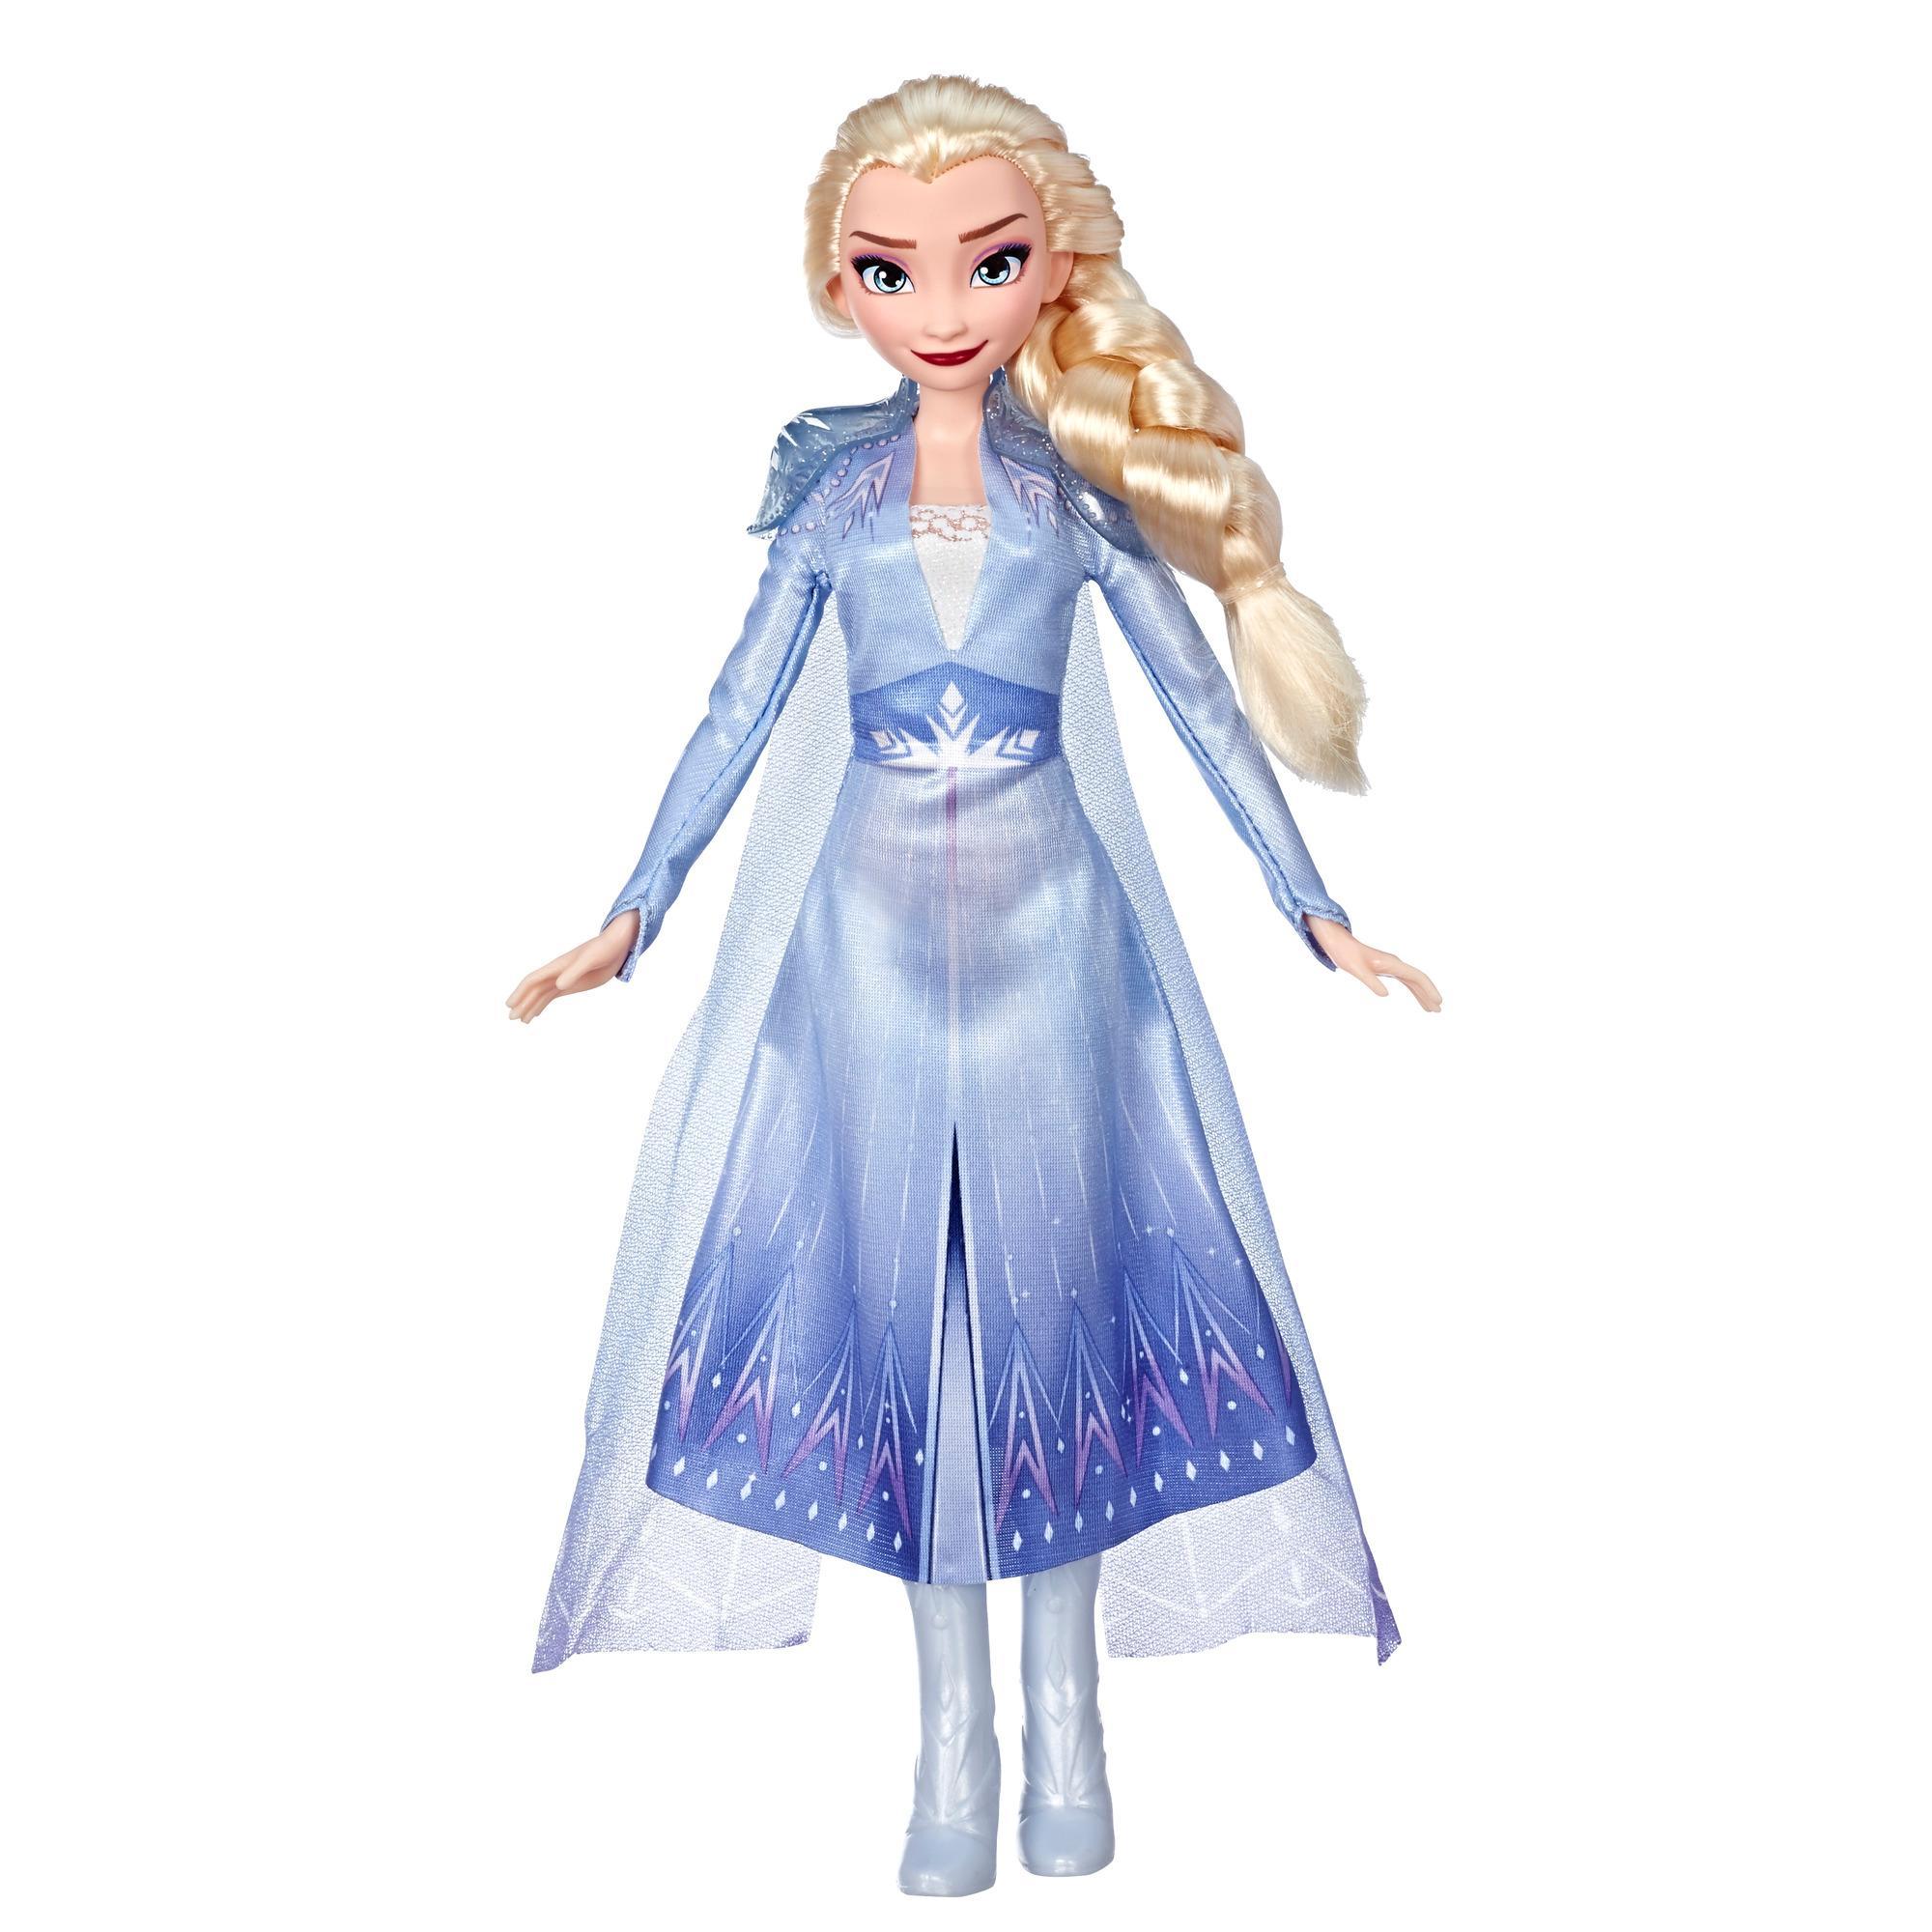 《 Disney 迪士尼 公主 》冰雪奇緣2基本人物組-艾莎